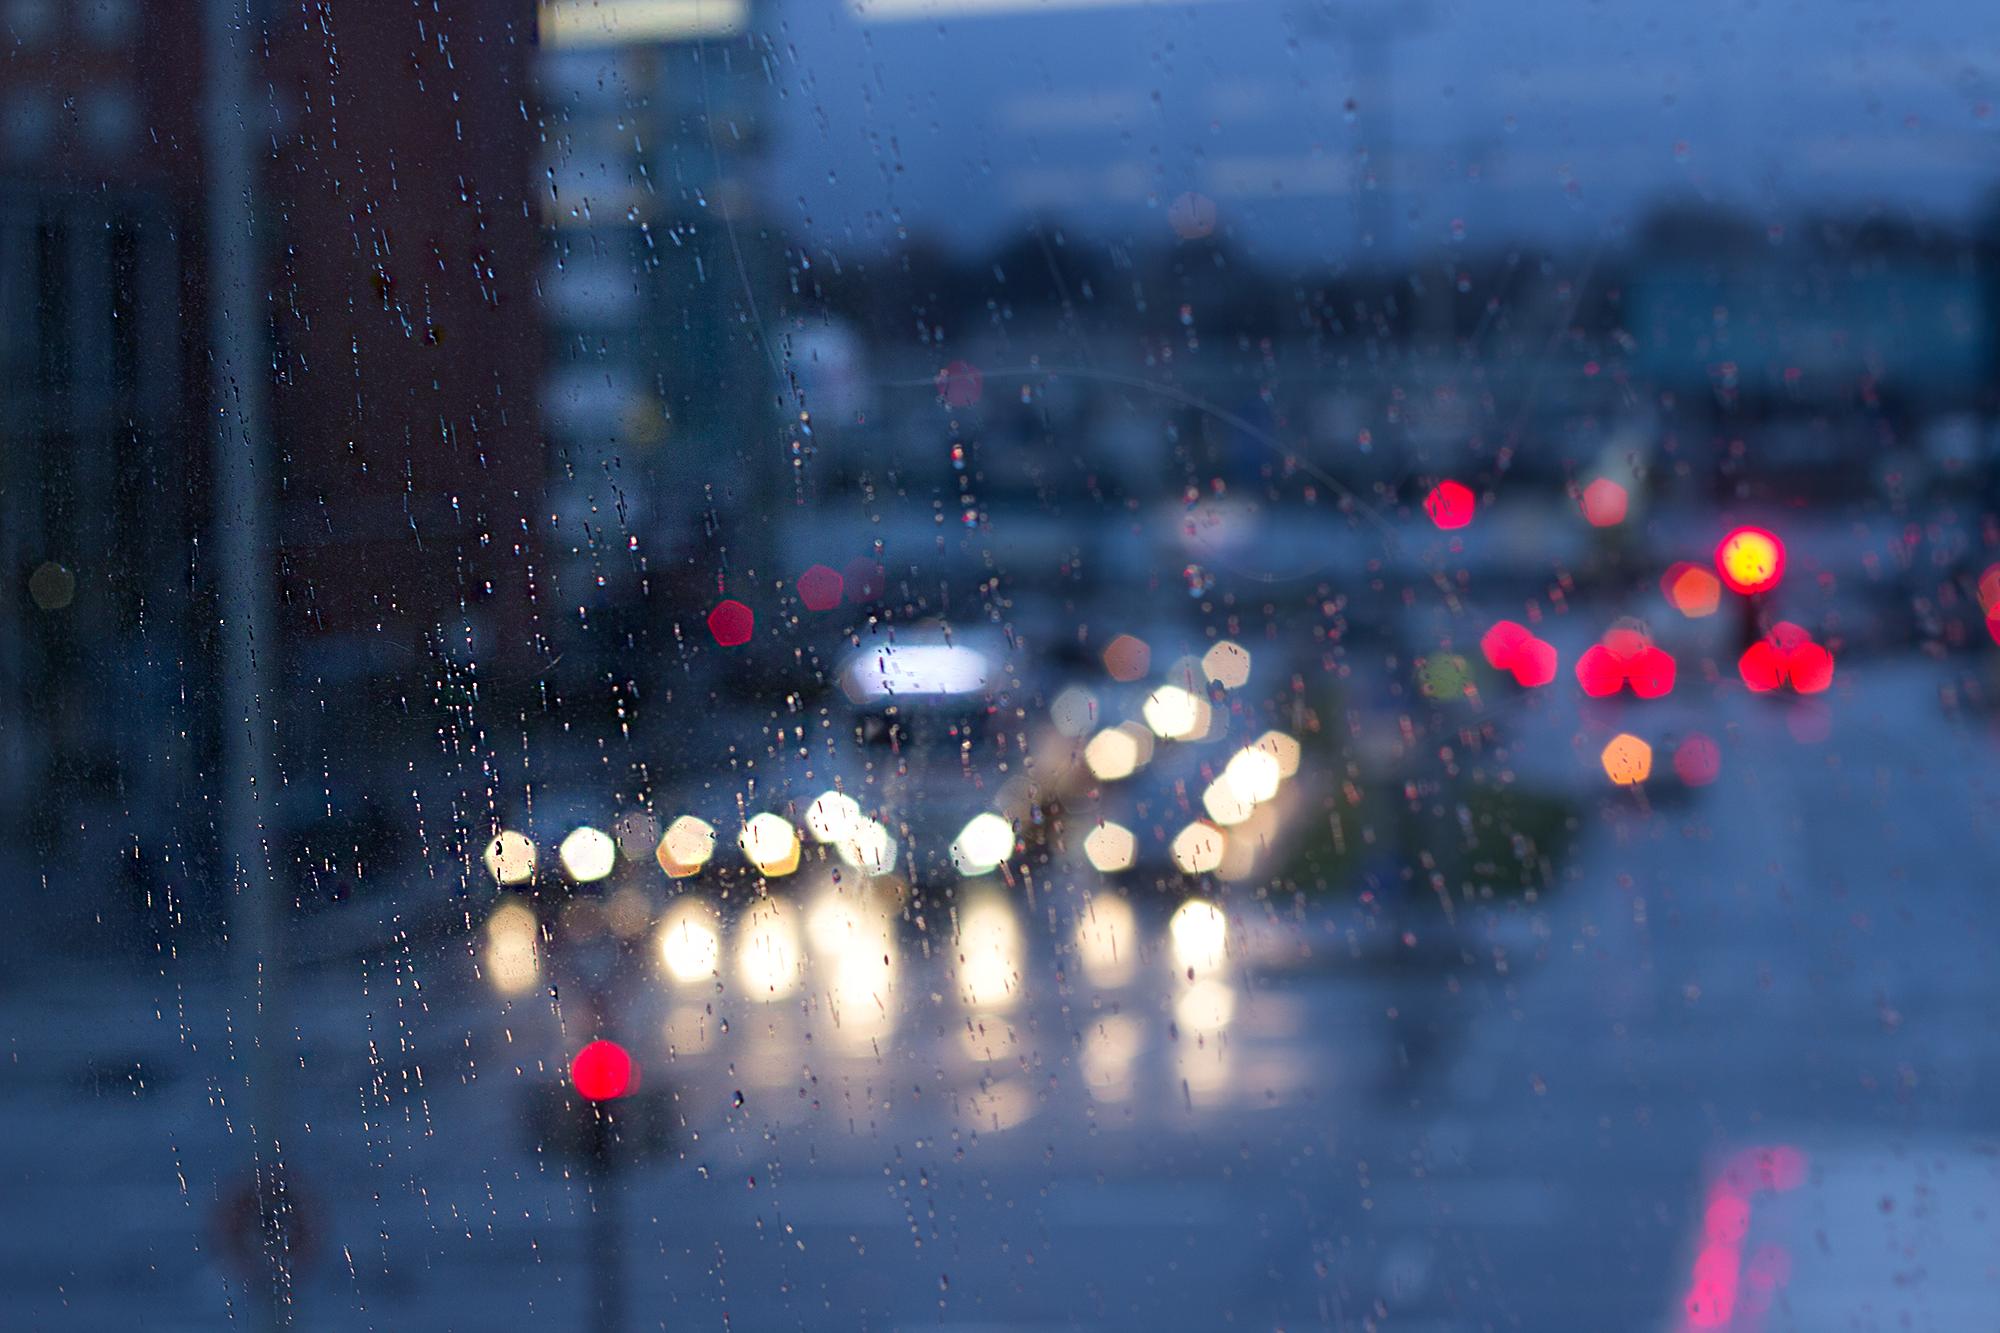 Fotografie bei Regen - Bokeh Straßenlichter